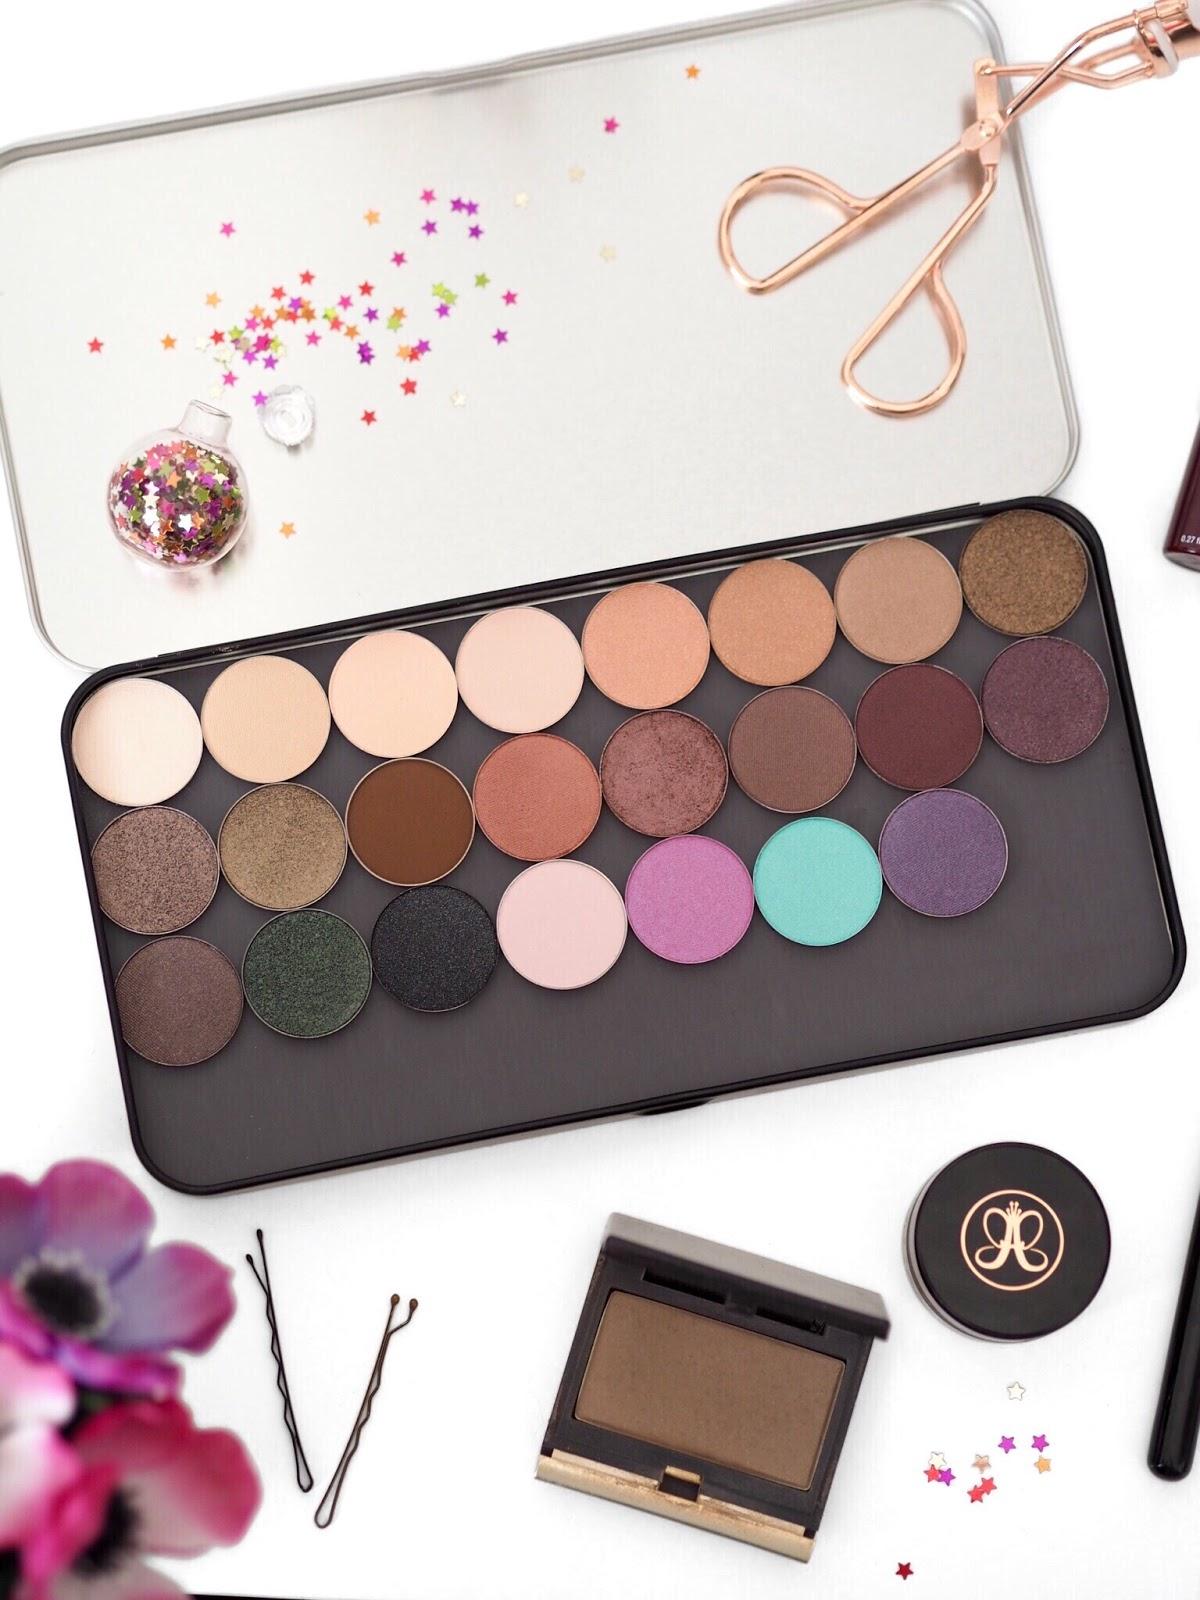 Anastasia Beverly Hills Black Friday Eyeshadow Haul + Swatches